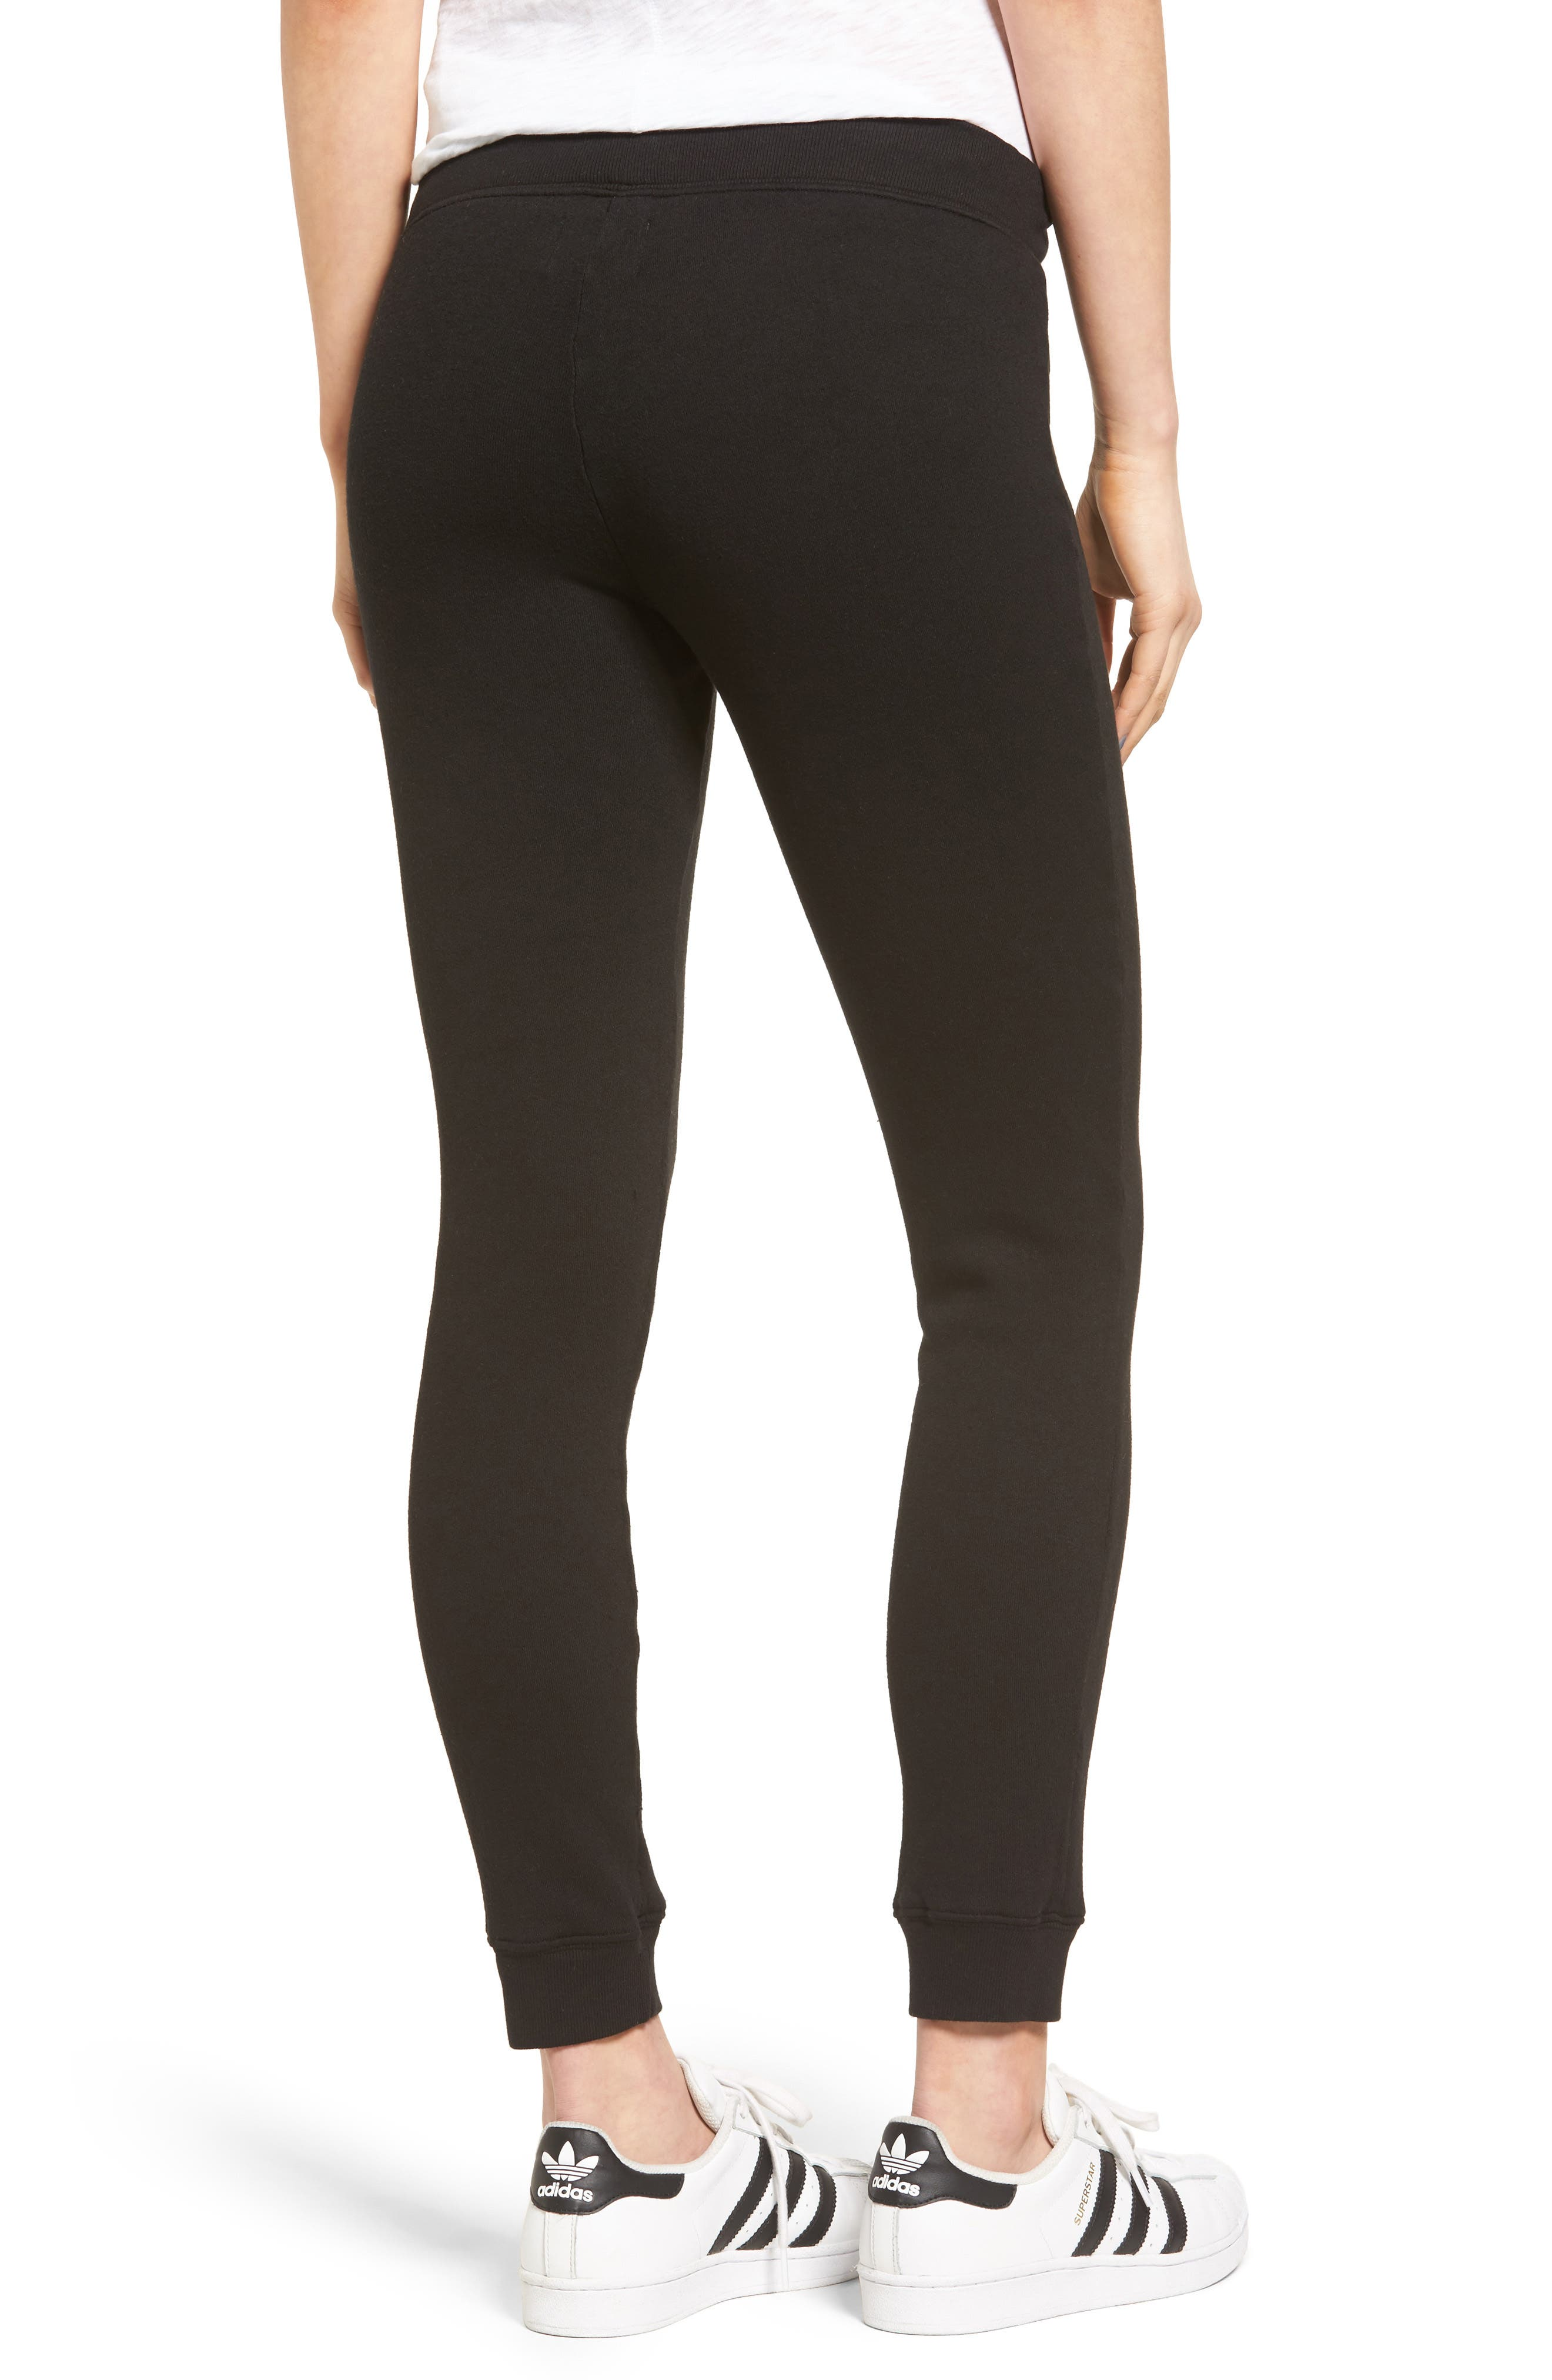 Betsee Distressed Jogger Pants,                             Alternate thumbnail 2, color,                             Black